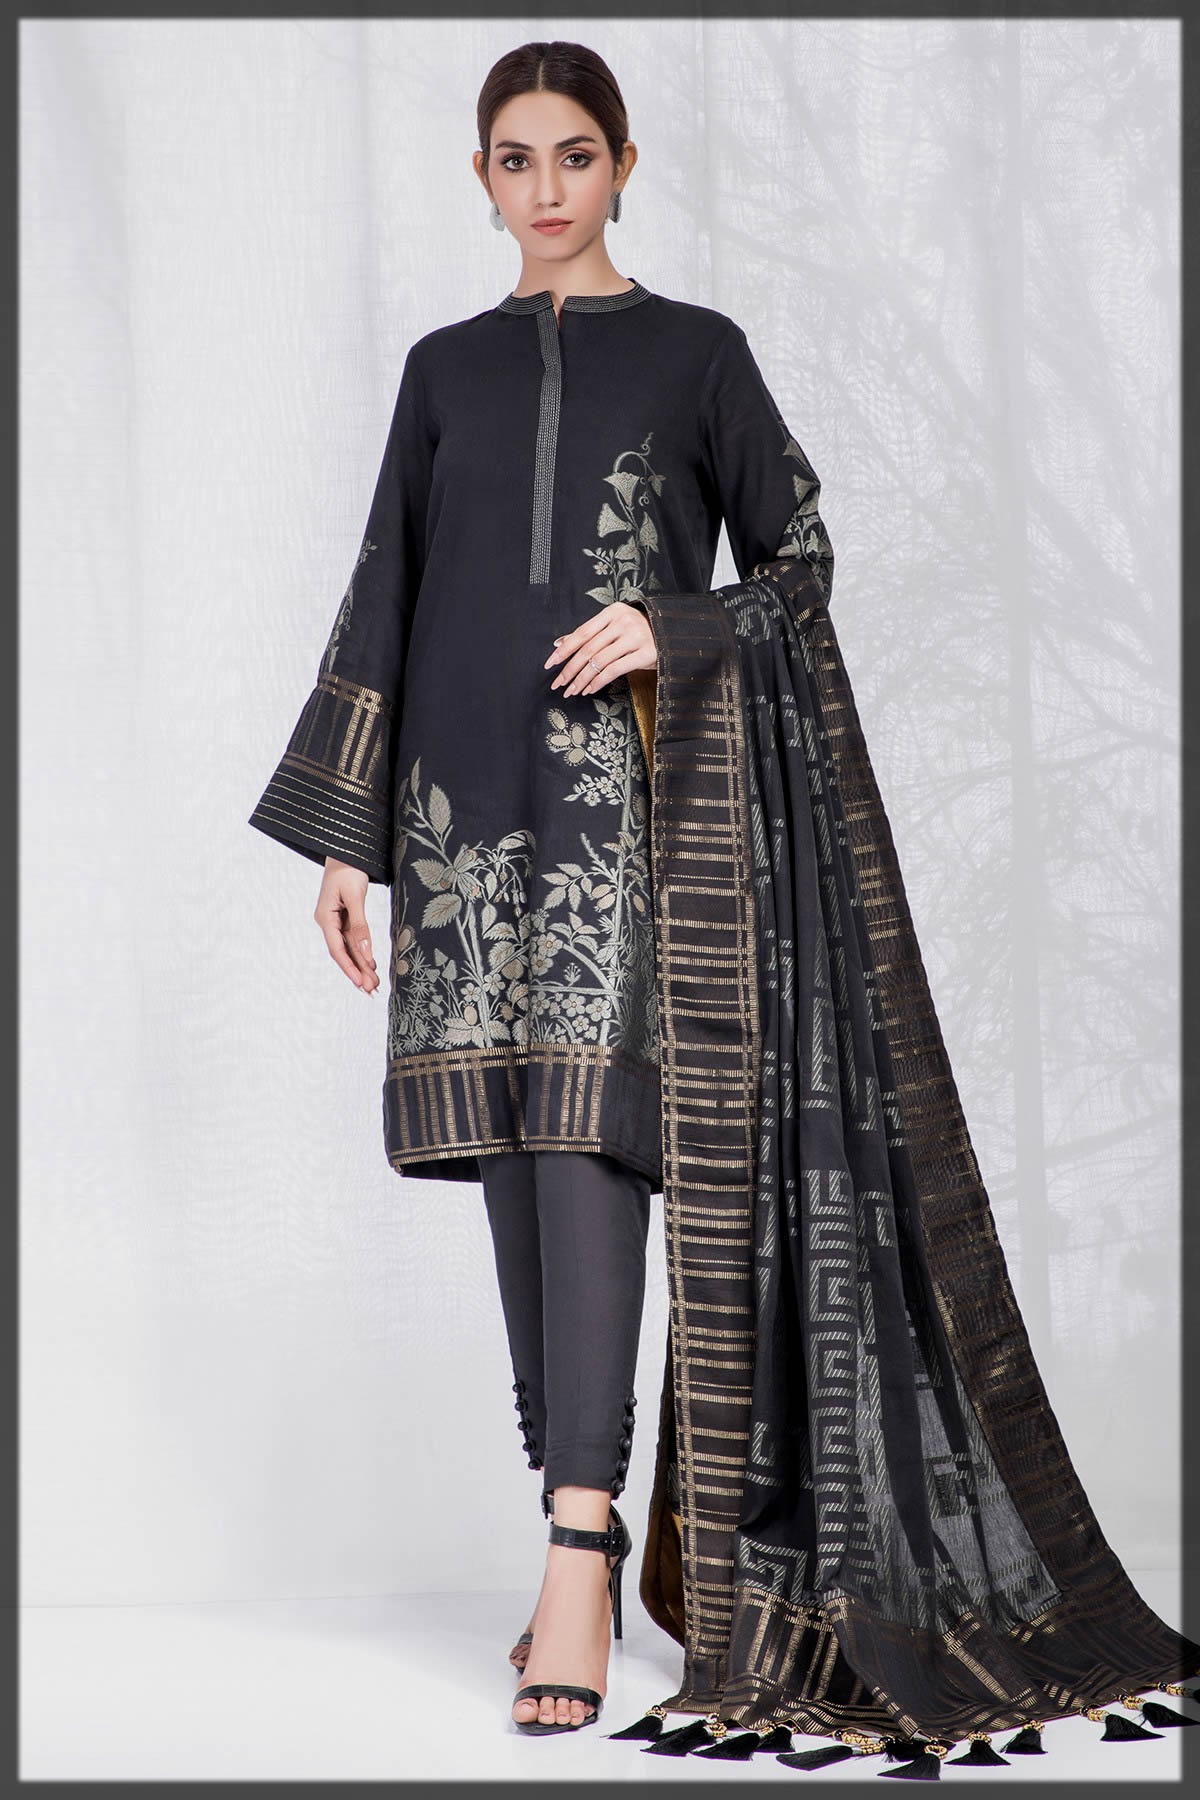 sleek black jacquard summer dress by alkaram